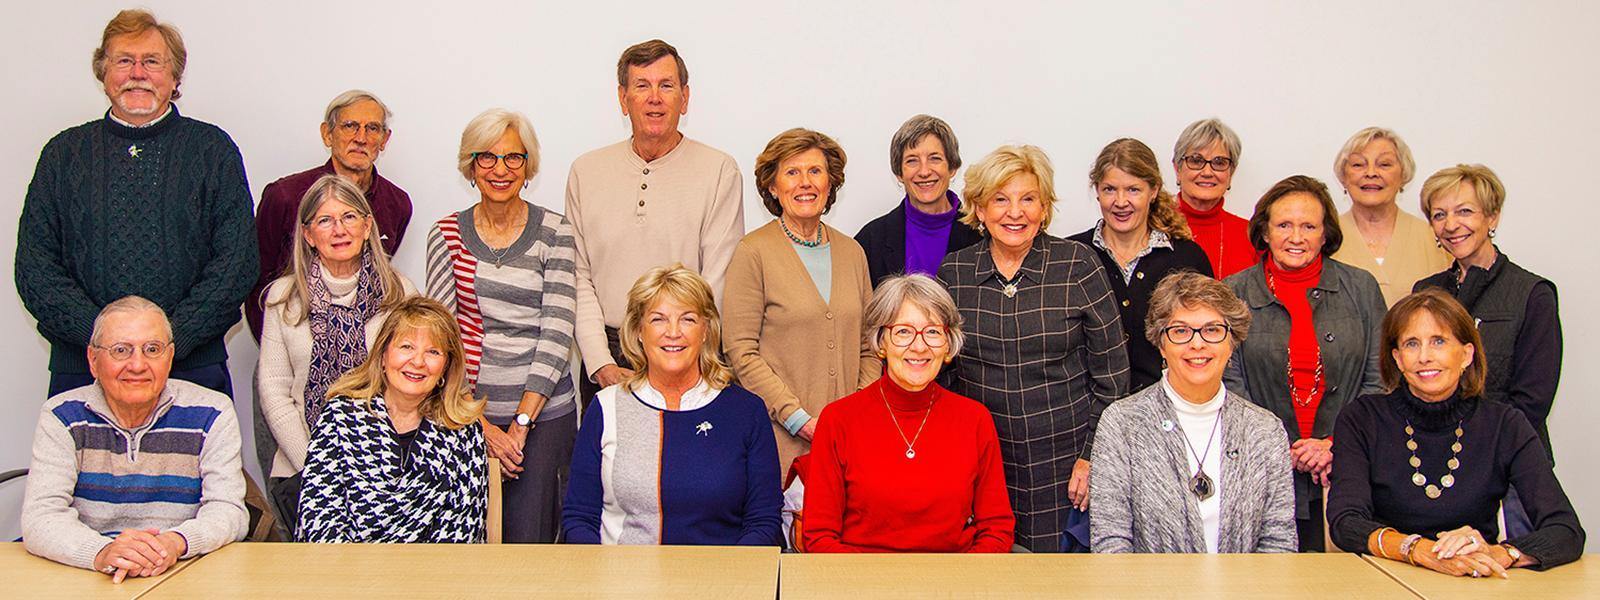 Associates Board members 2019-2020